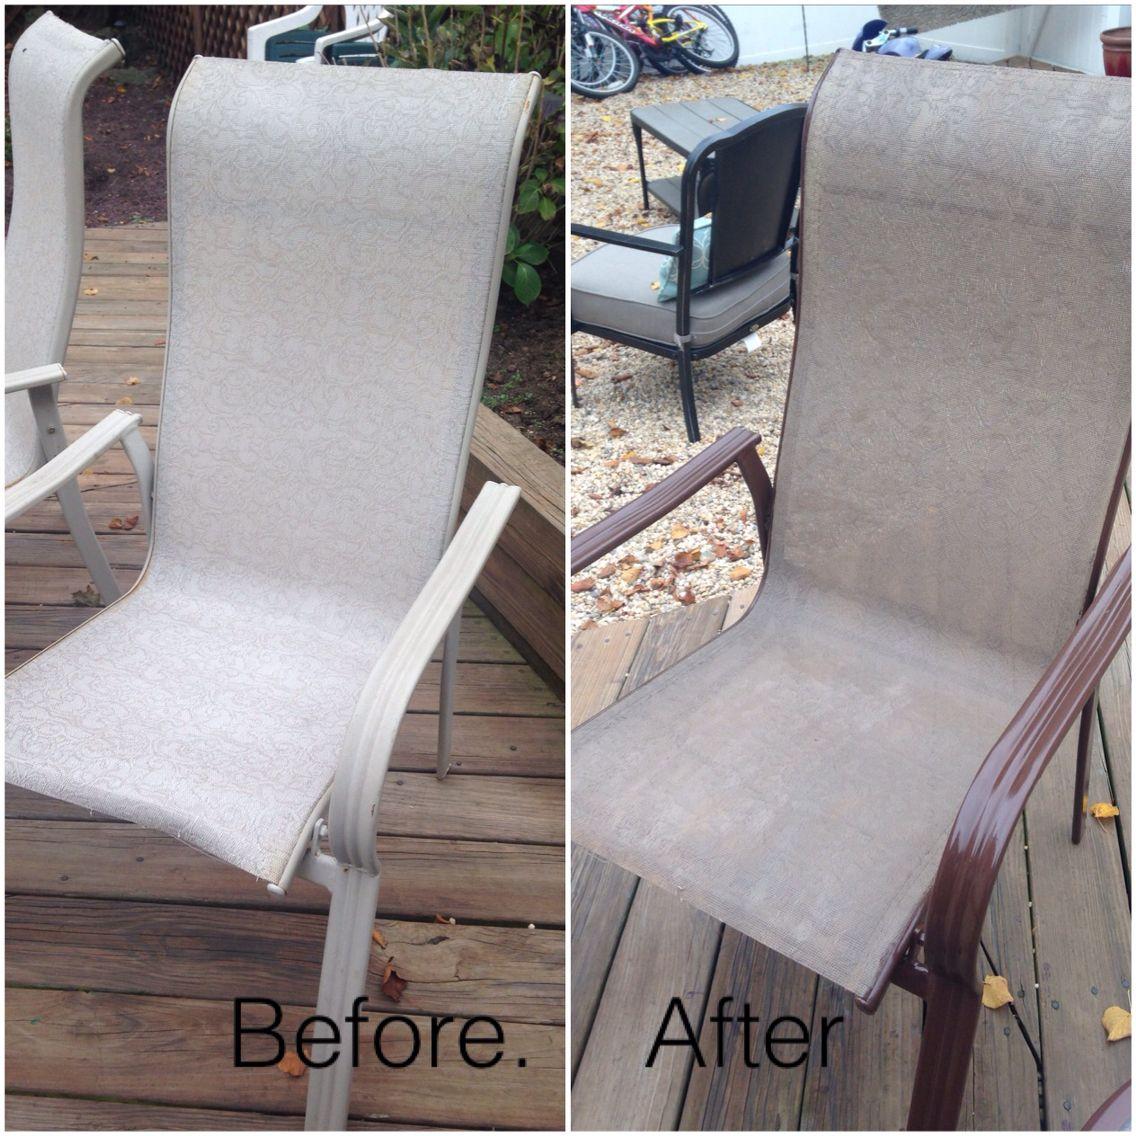 Old patio furnitureno problem ! Spray paint fabric